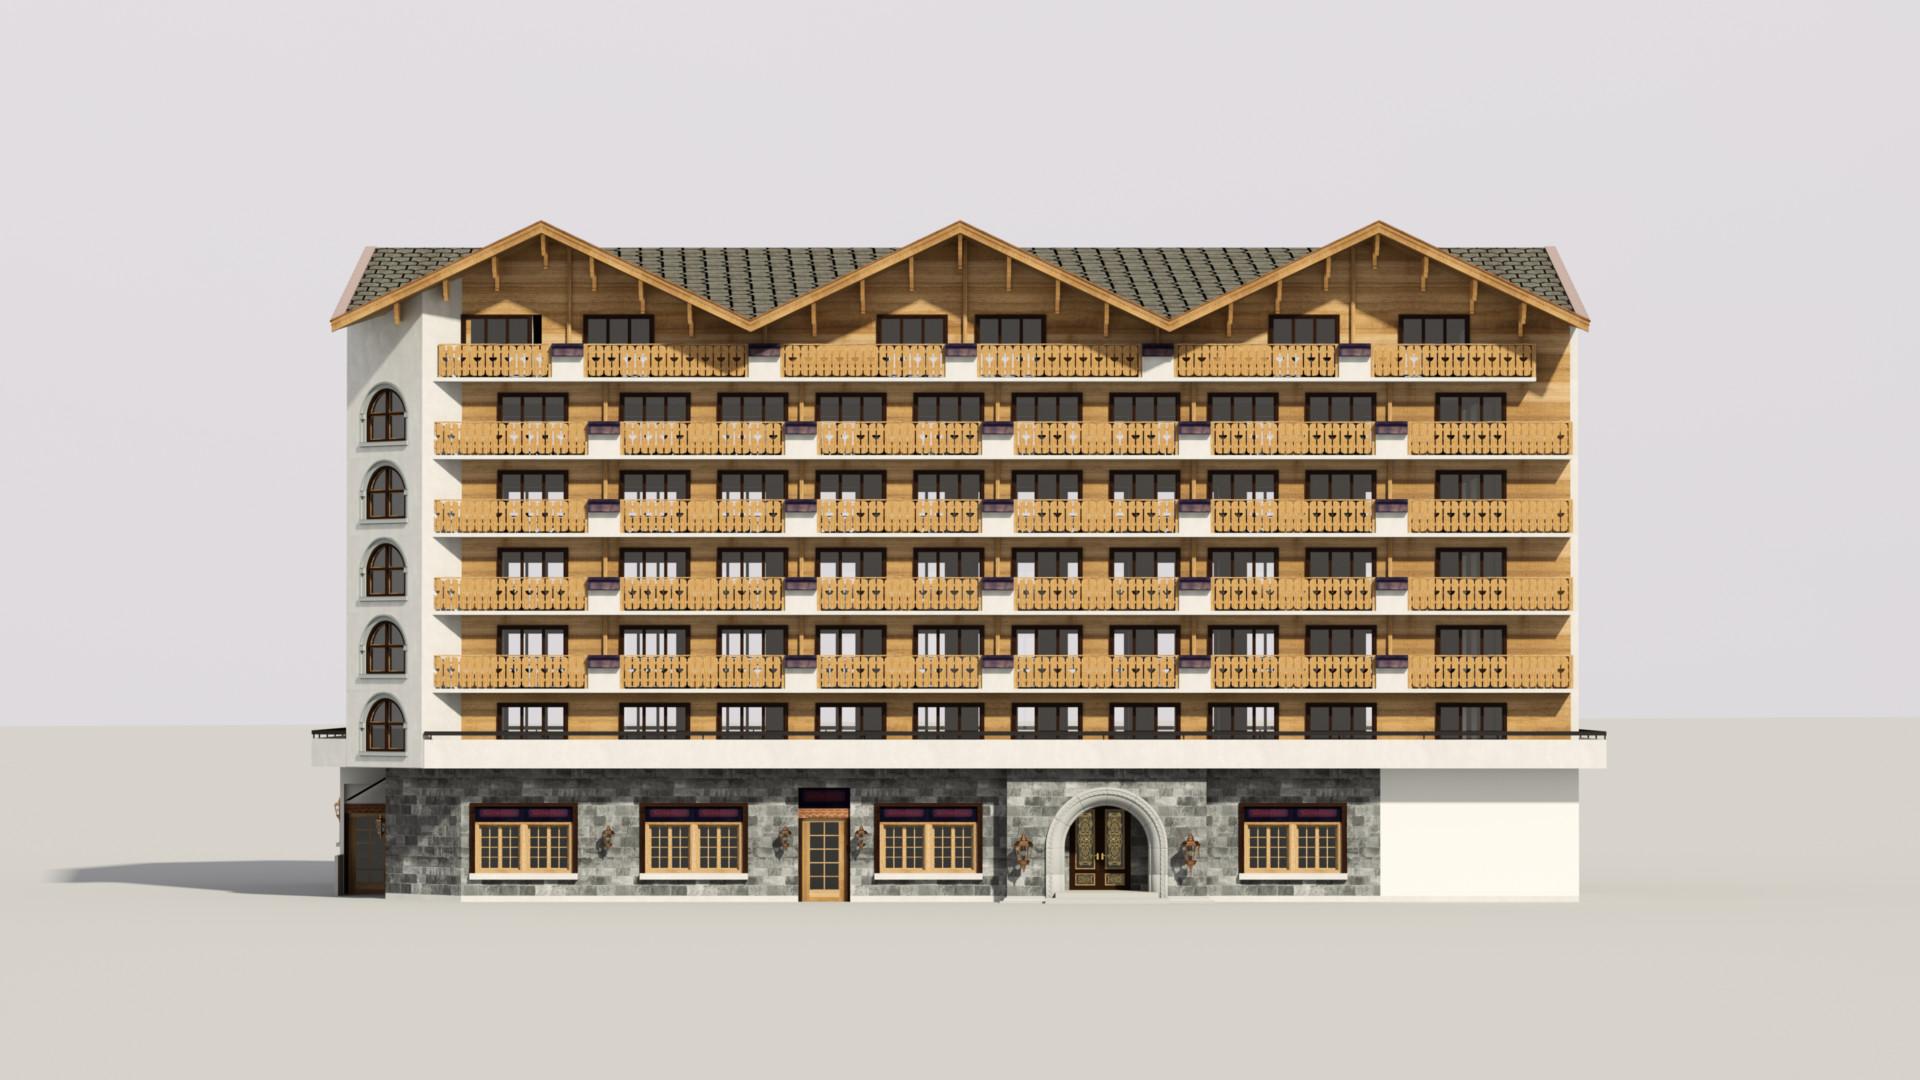 Duane kemp alpine hotel ppe scene 6